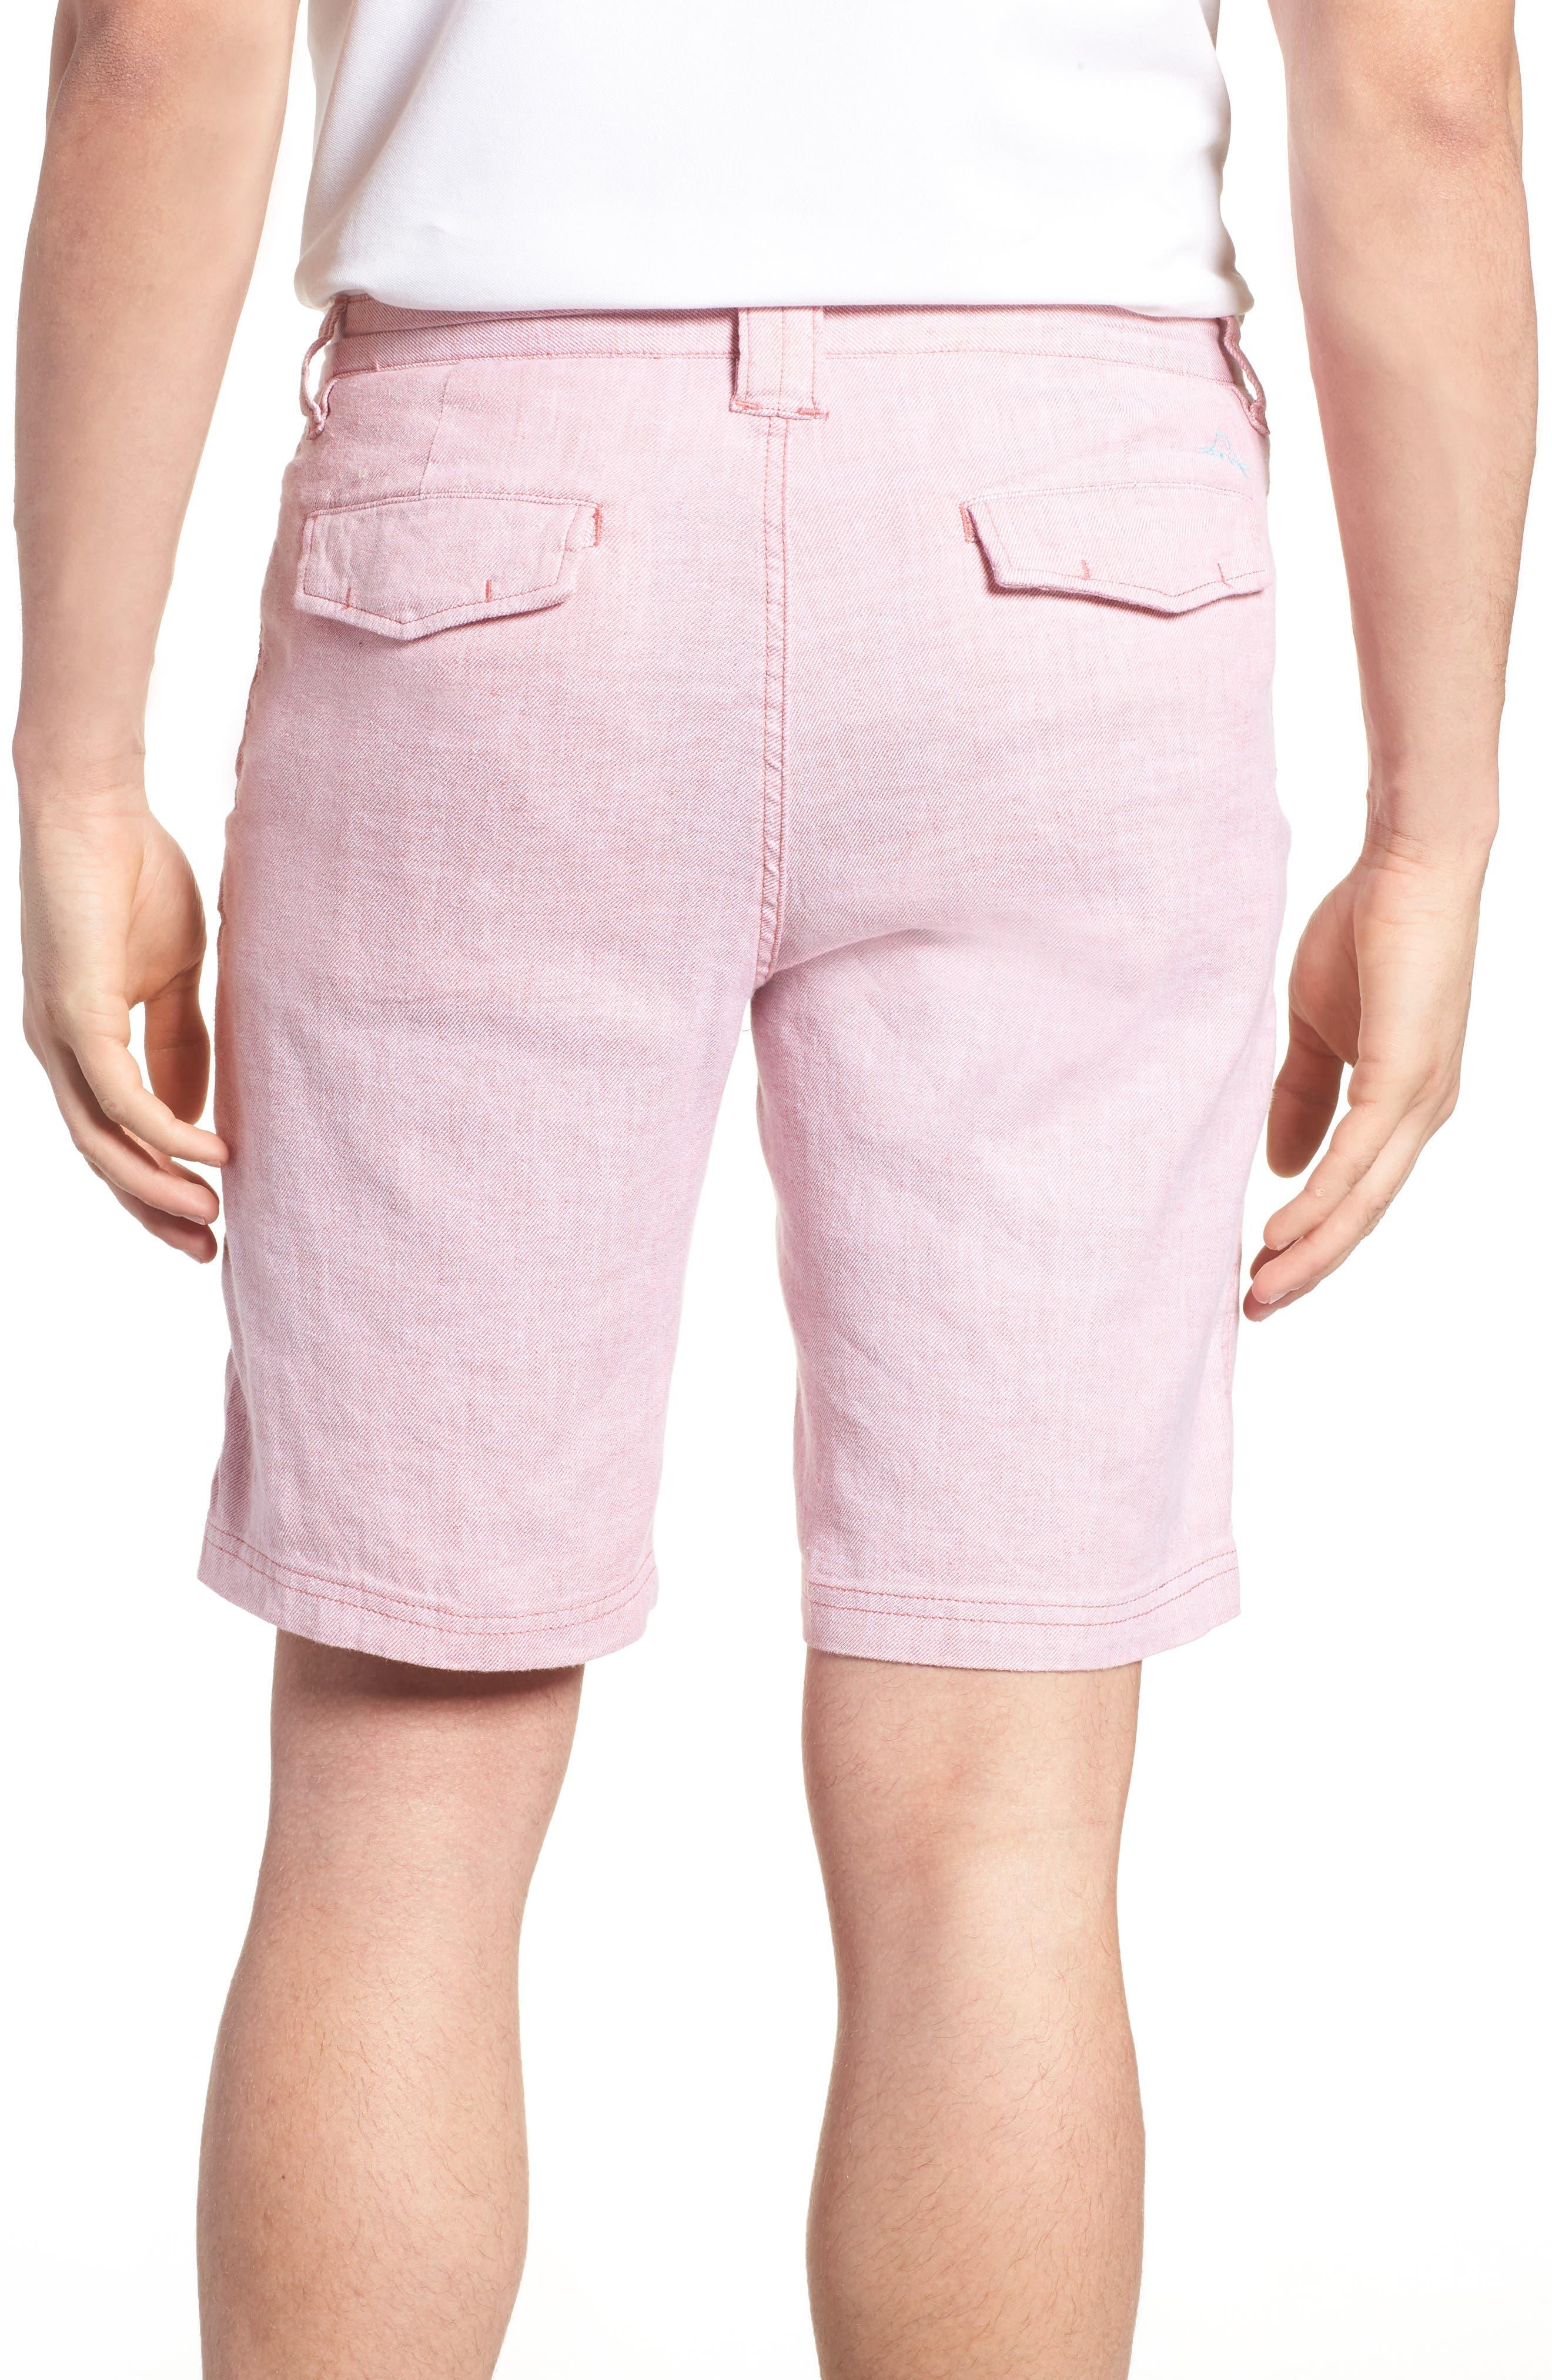 Beach Linen Blend Shorts,                             Alternate thumbnail 2, color,                             Red Sunset